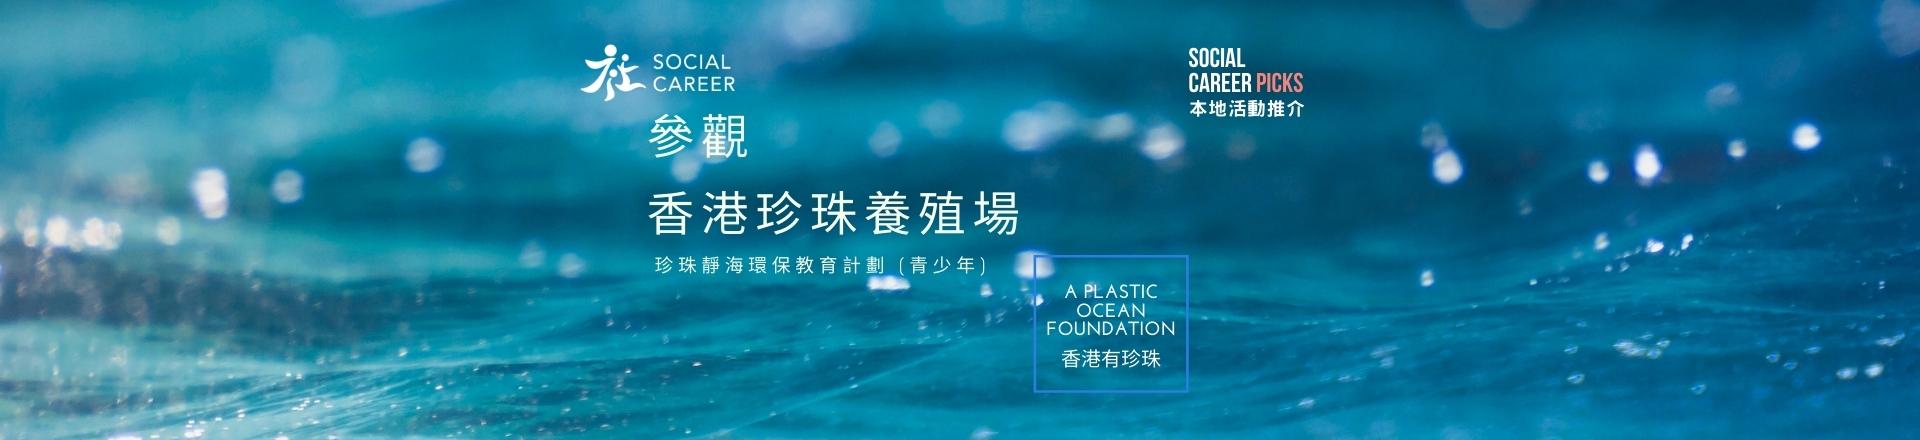 a plastic ocean 參觀香港珍珠養殖場